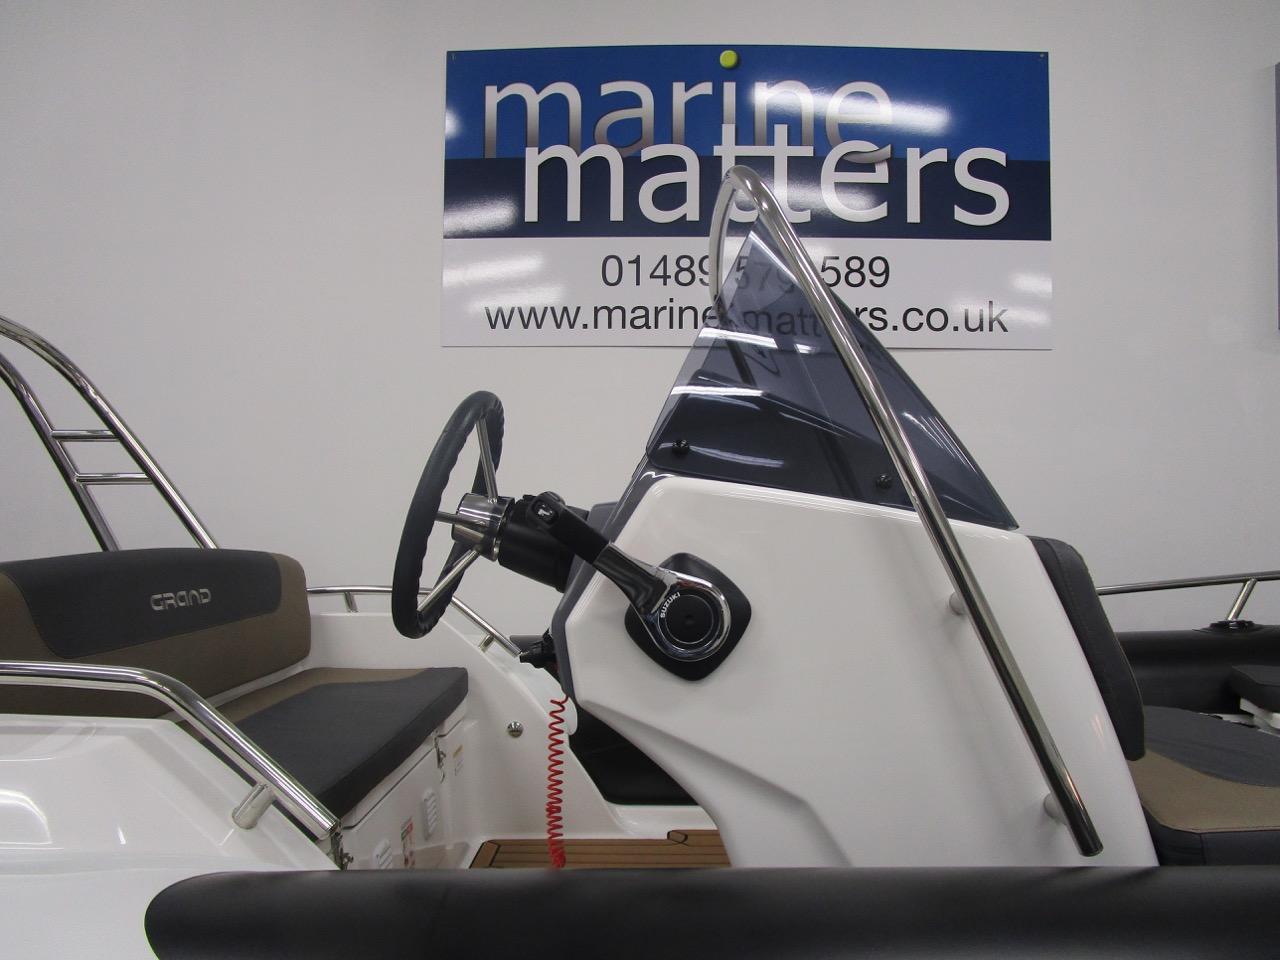 GRAND G500 RIB steering console